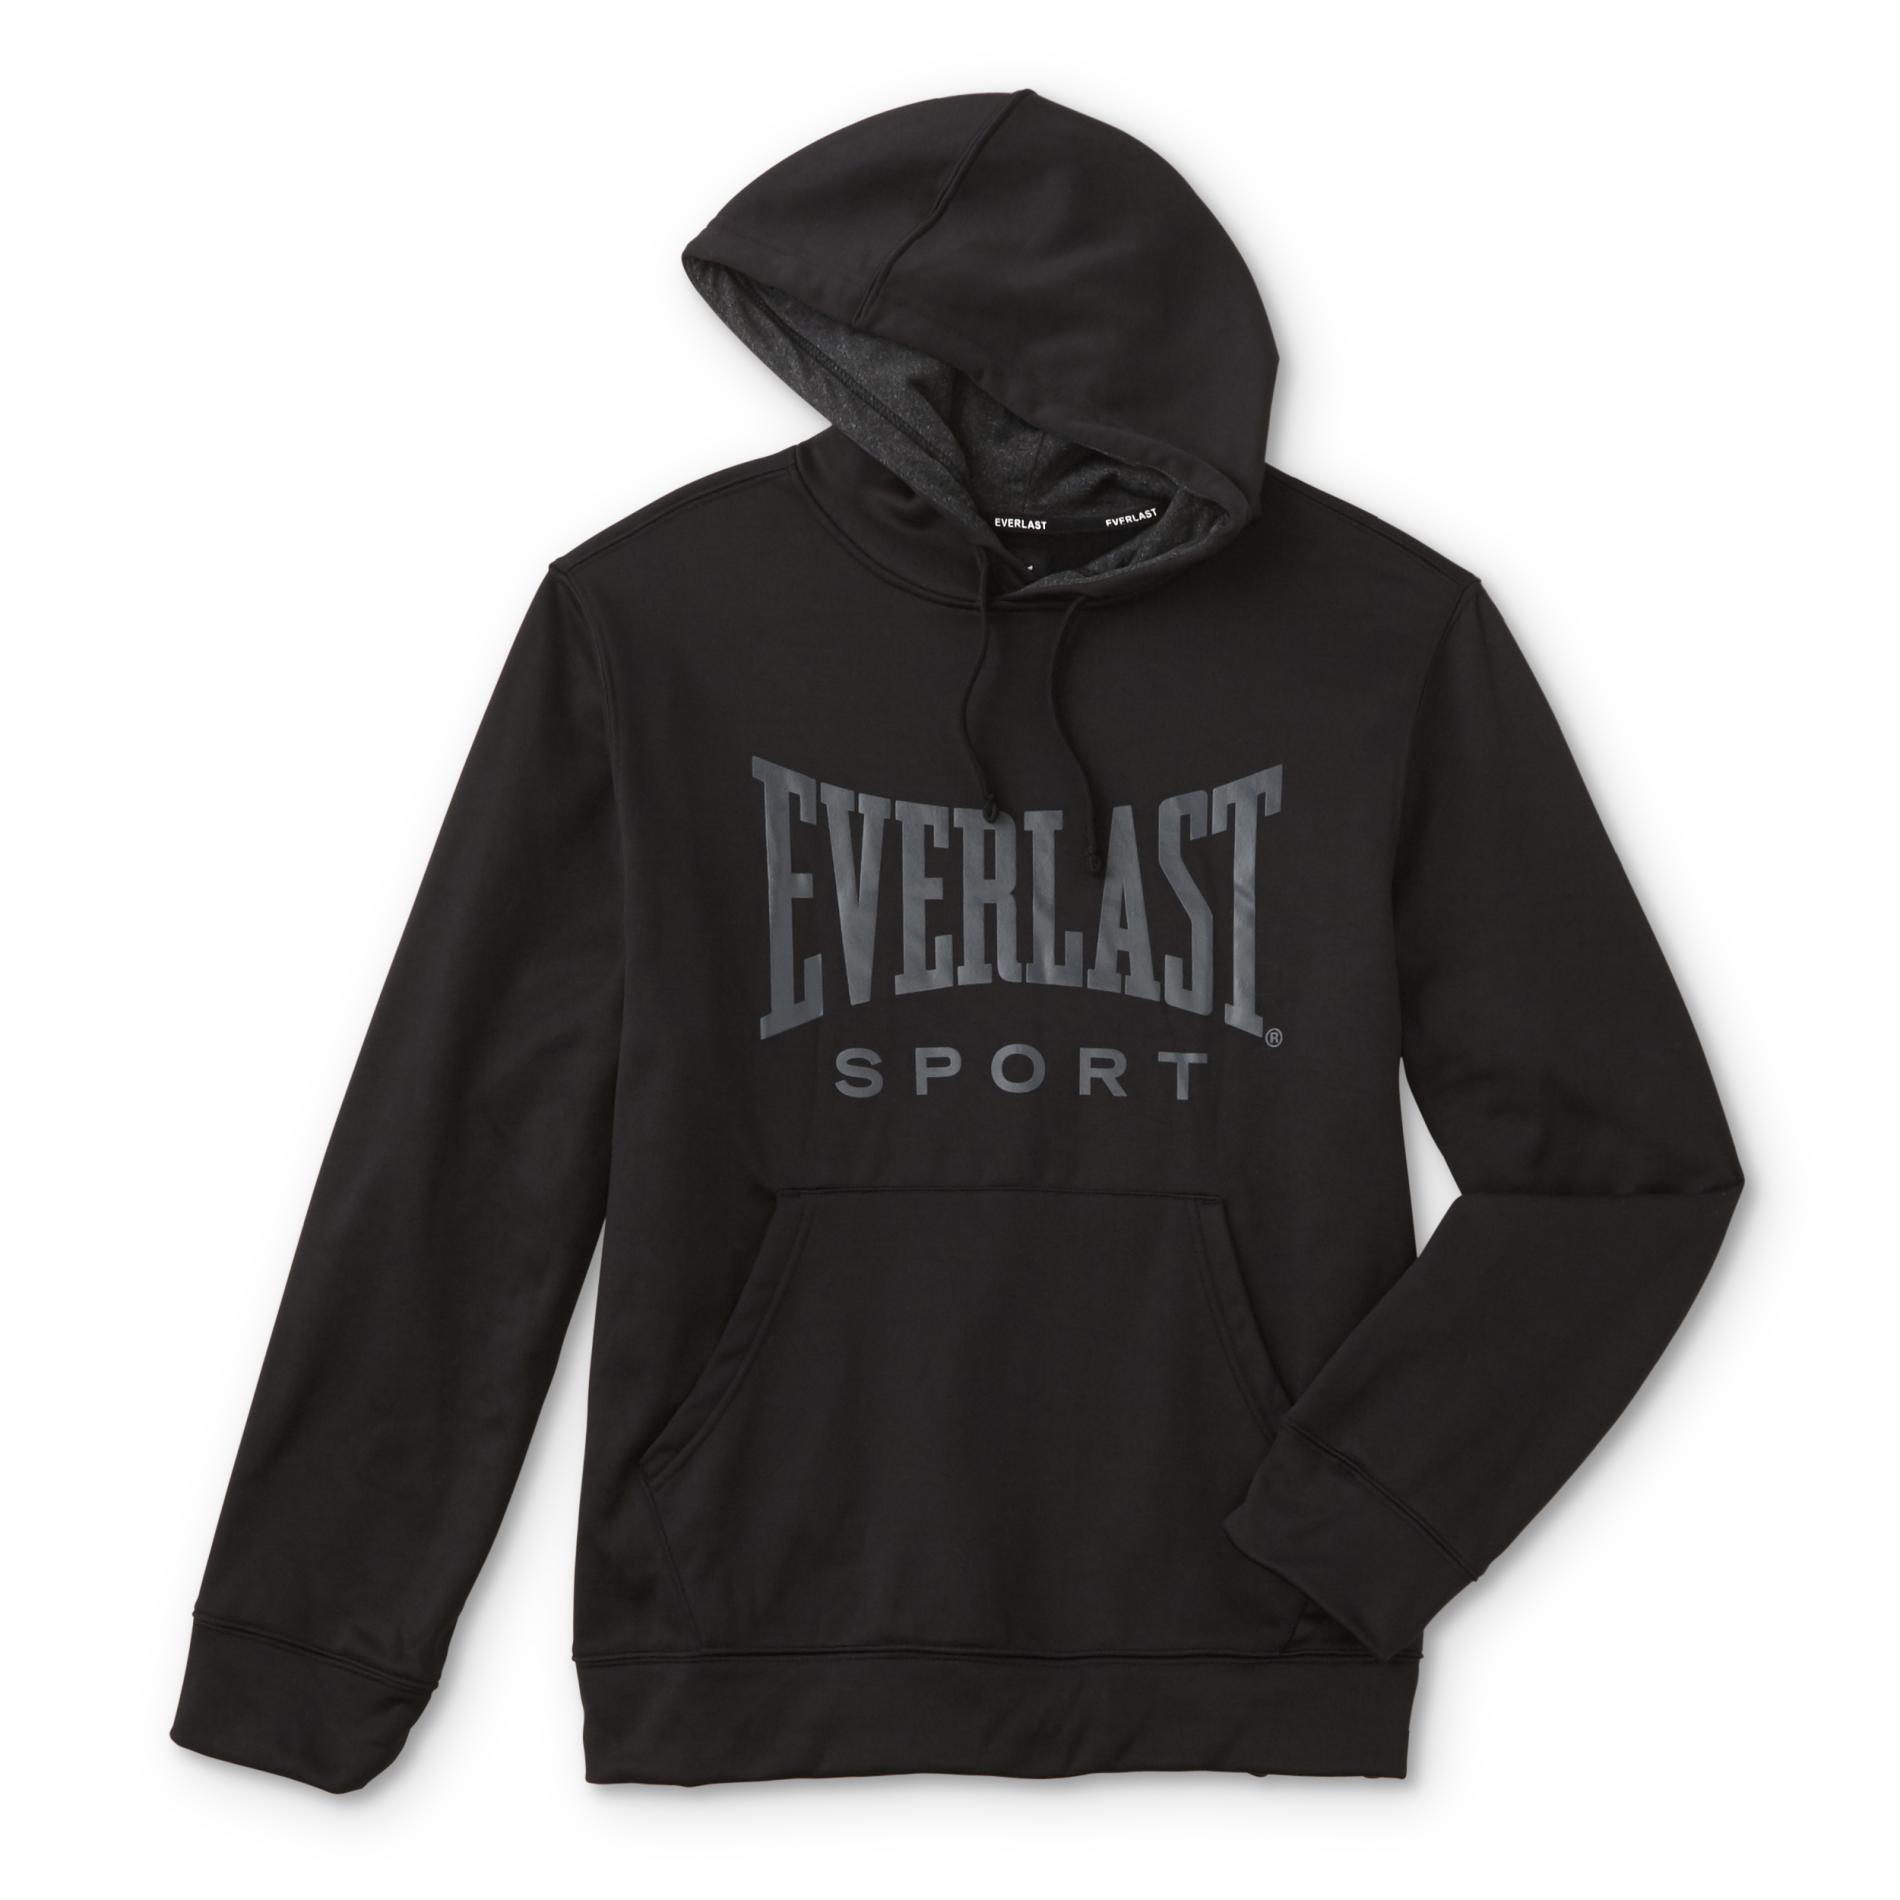 Everlast® Sport Men's Performance Fleece Athletic Hoodie PartNumber: A027997823 MfgPartNumber: MF8EK36575YM